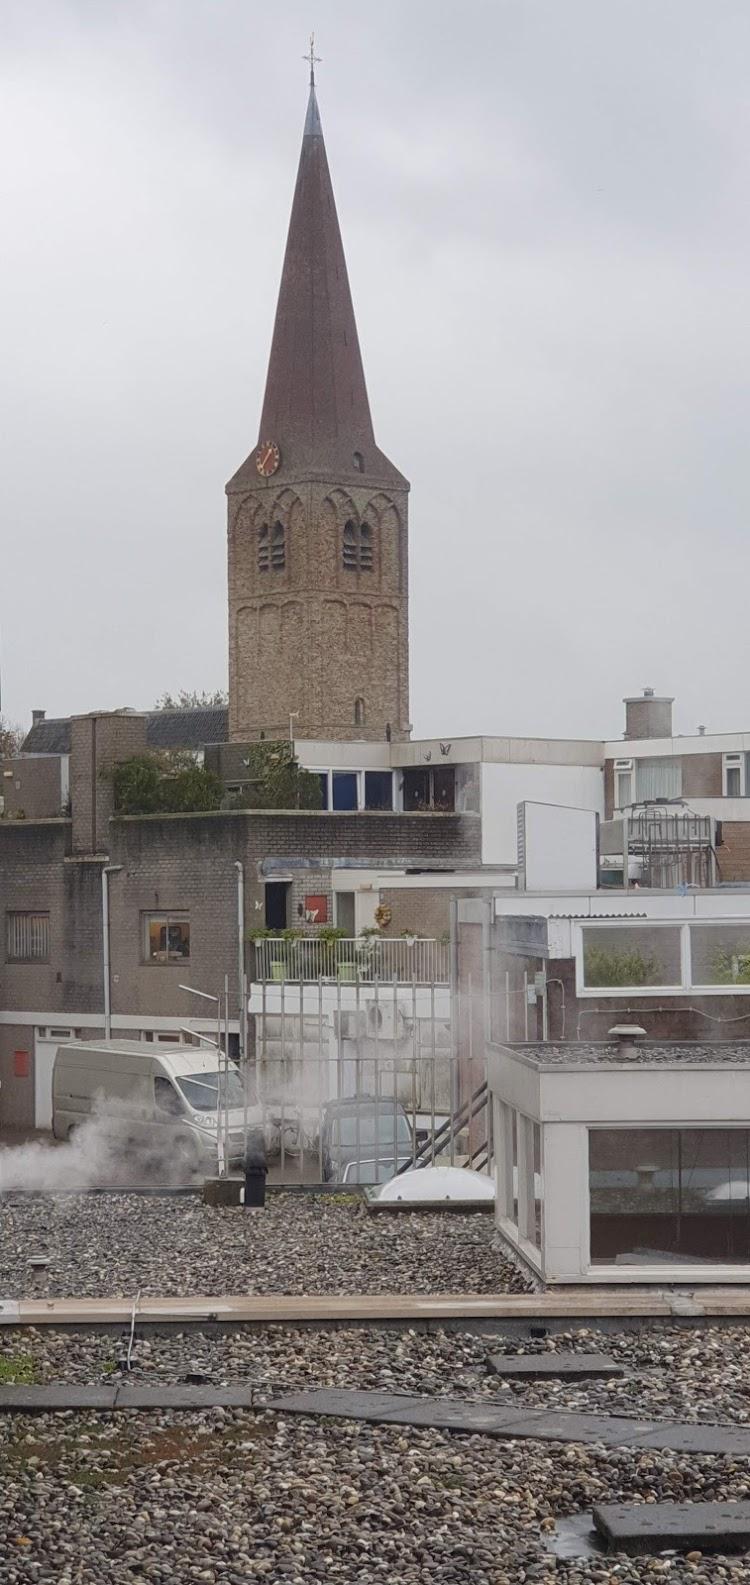 Blokker Heemskerk Heemskerk